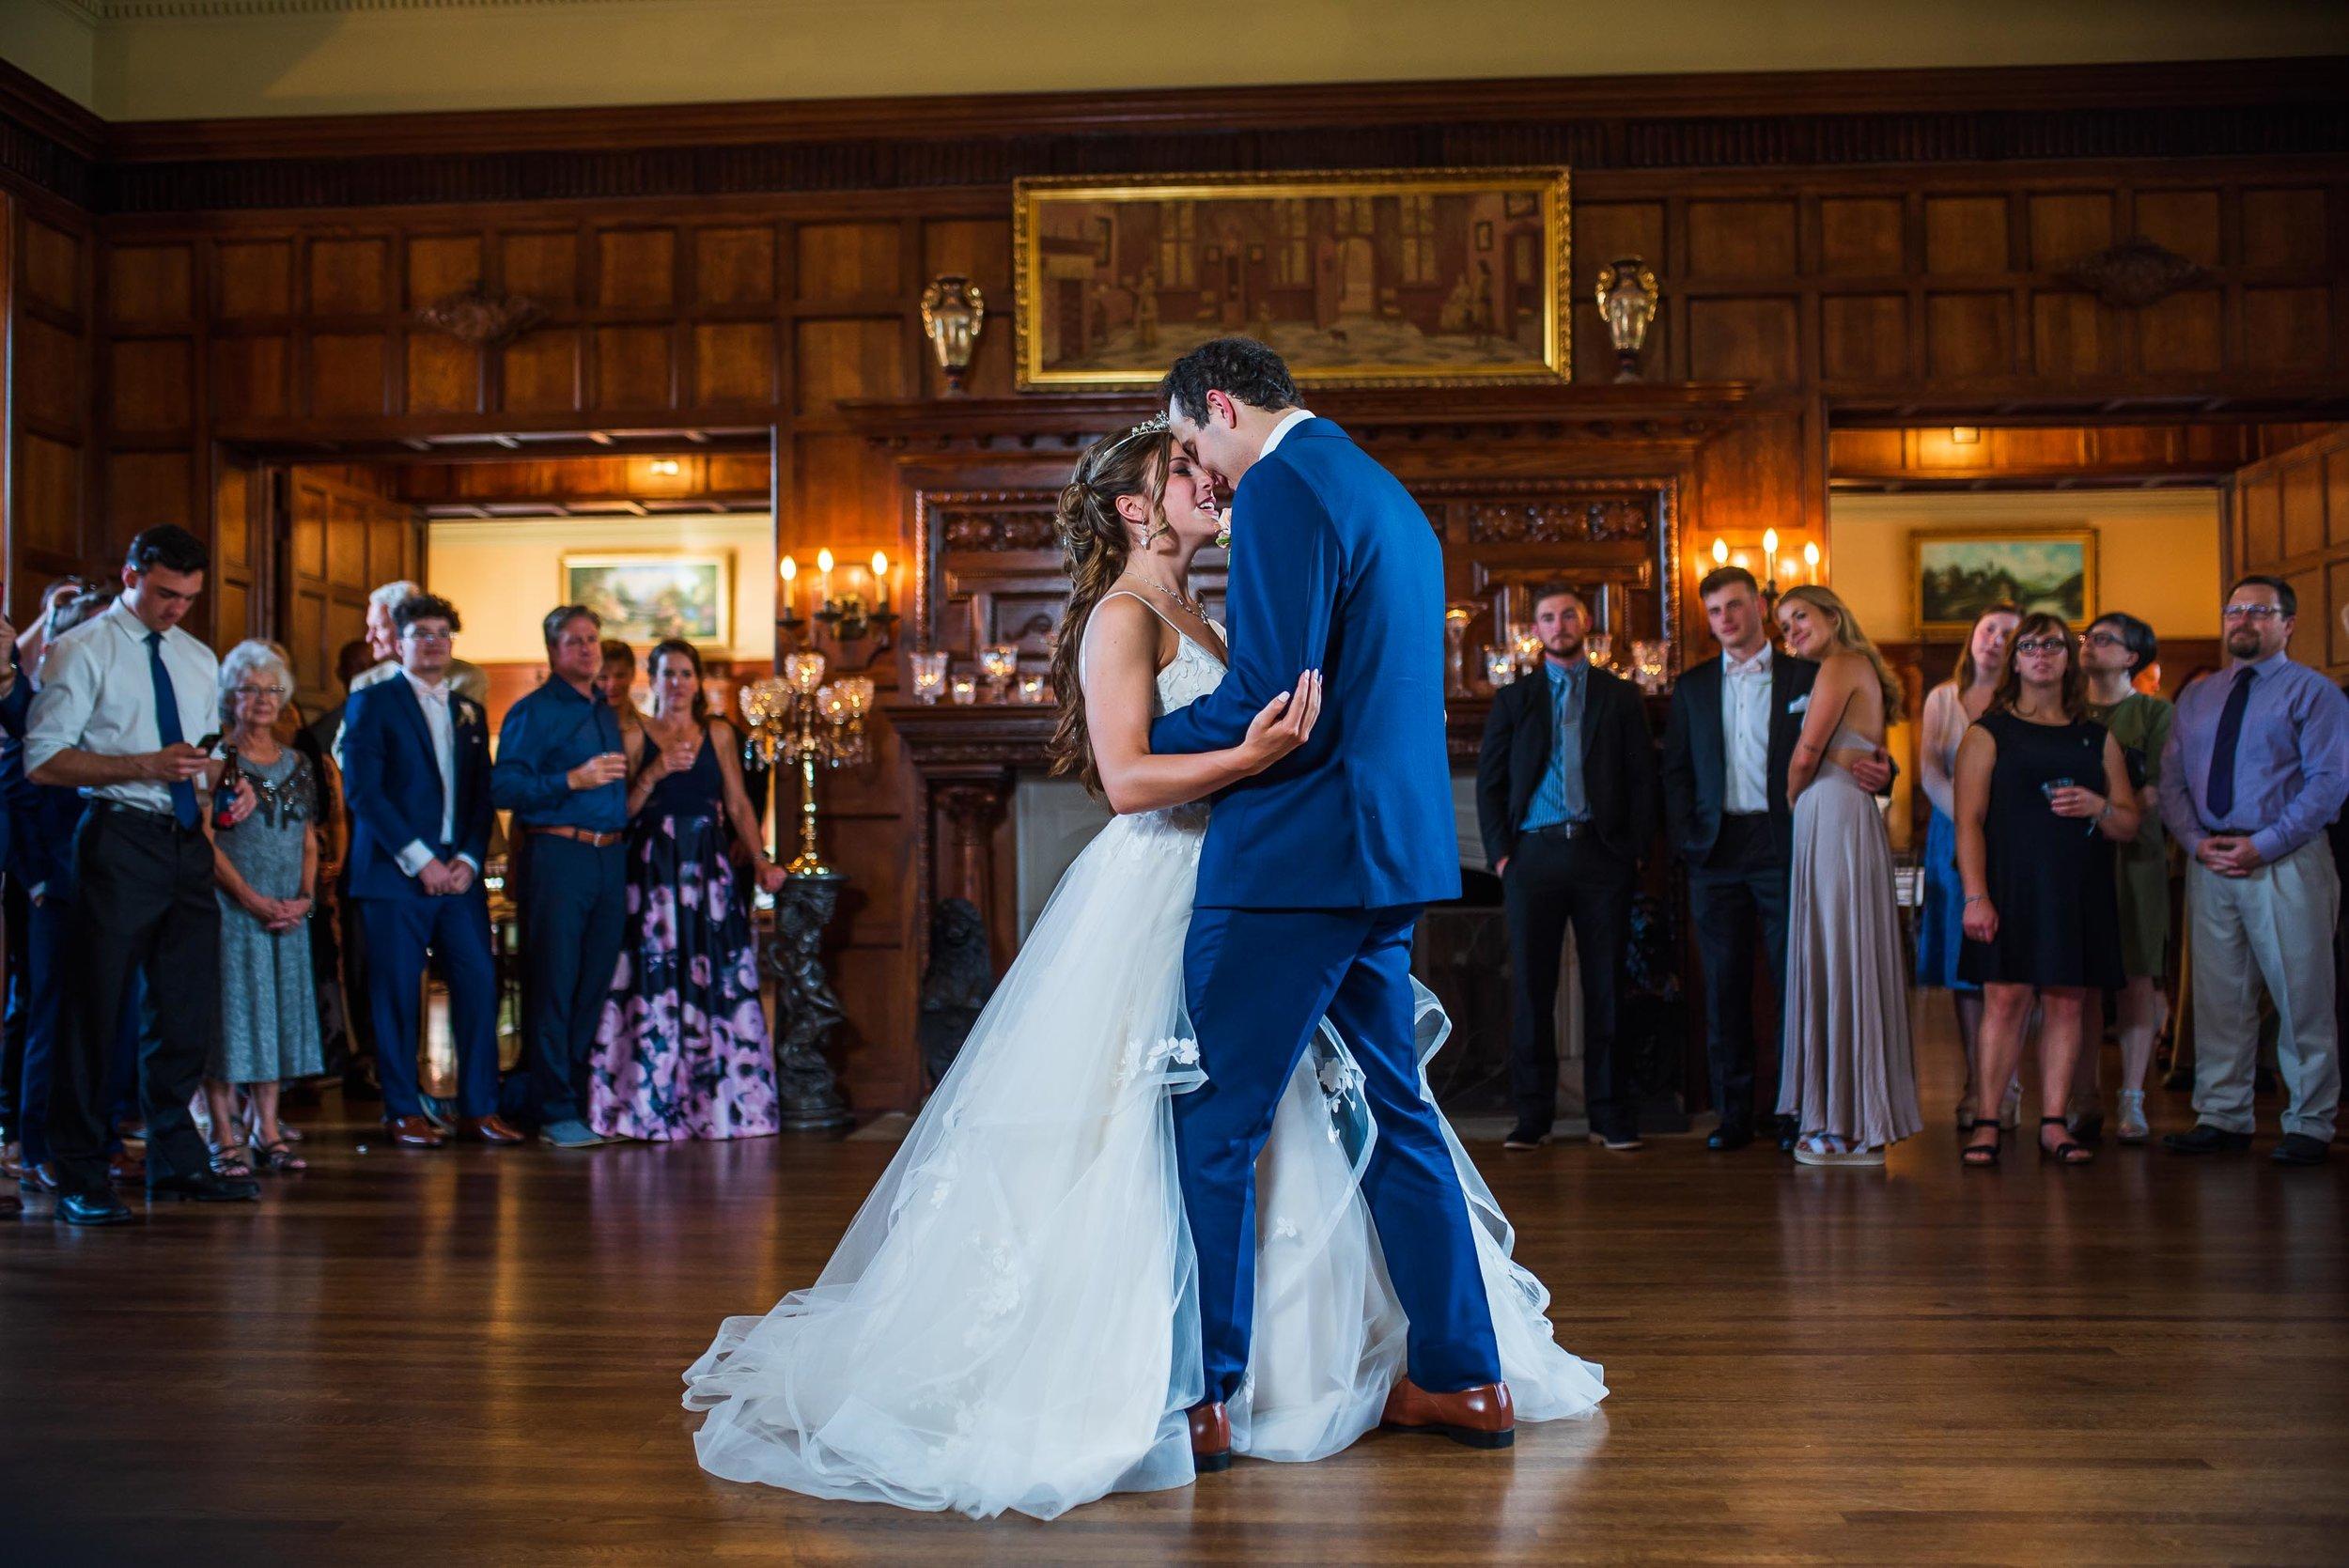 thornewood castle wedding 65.jpg